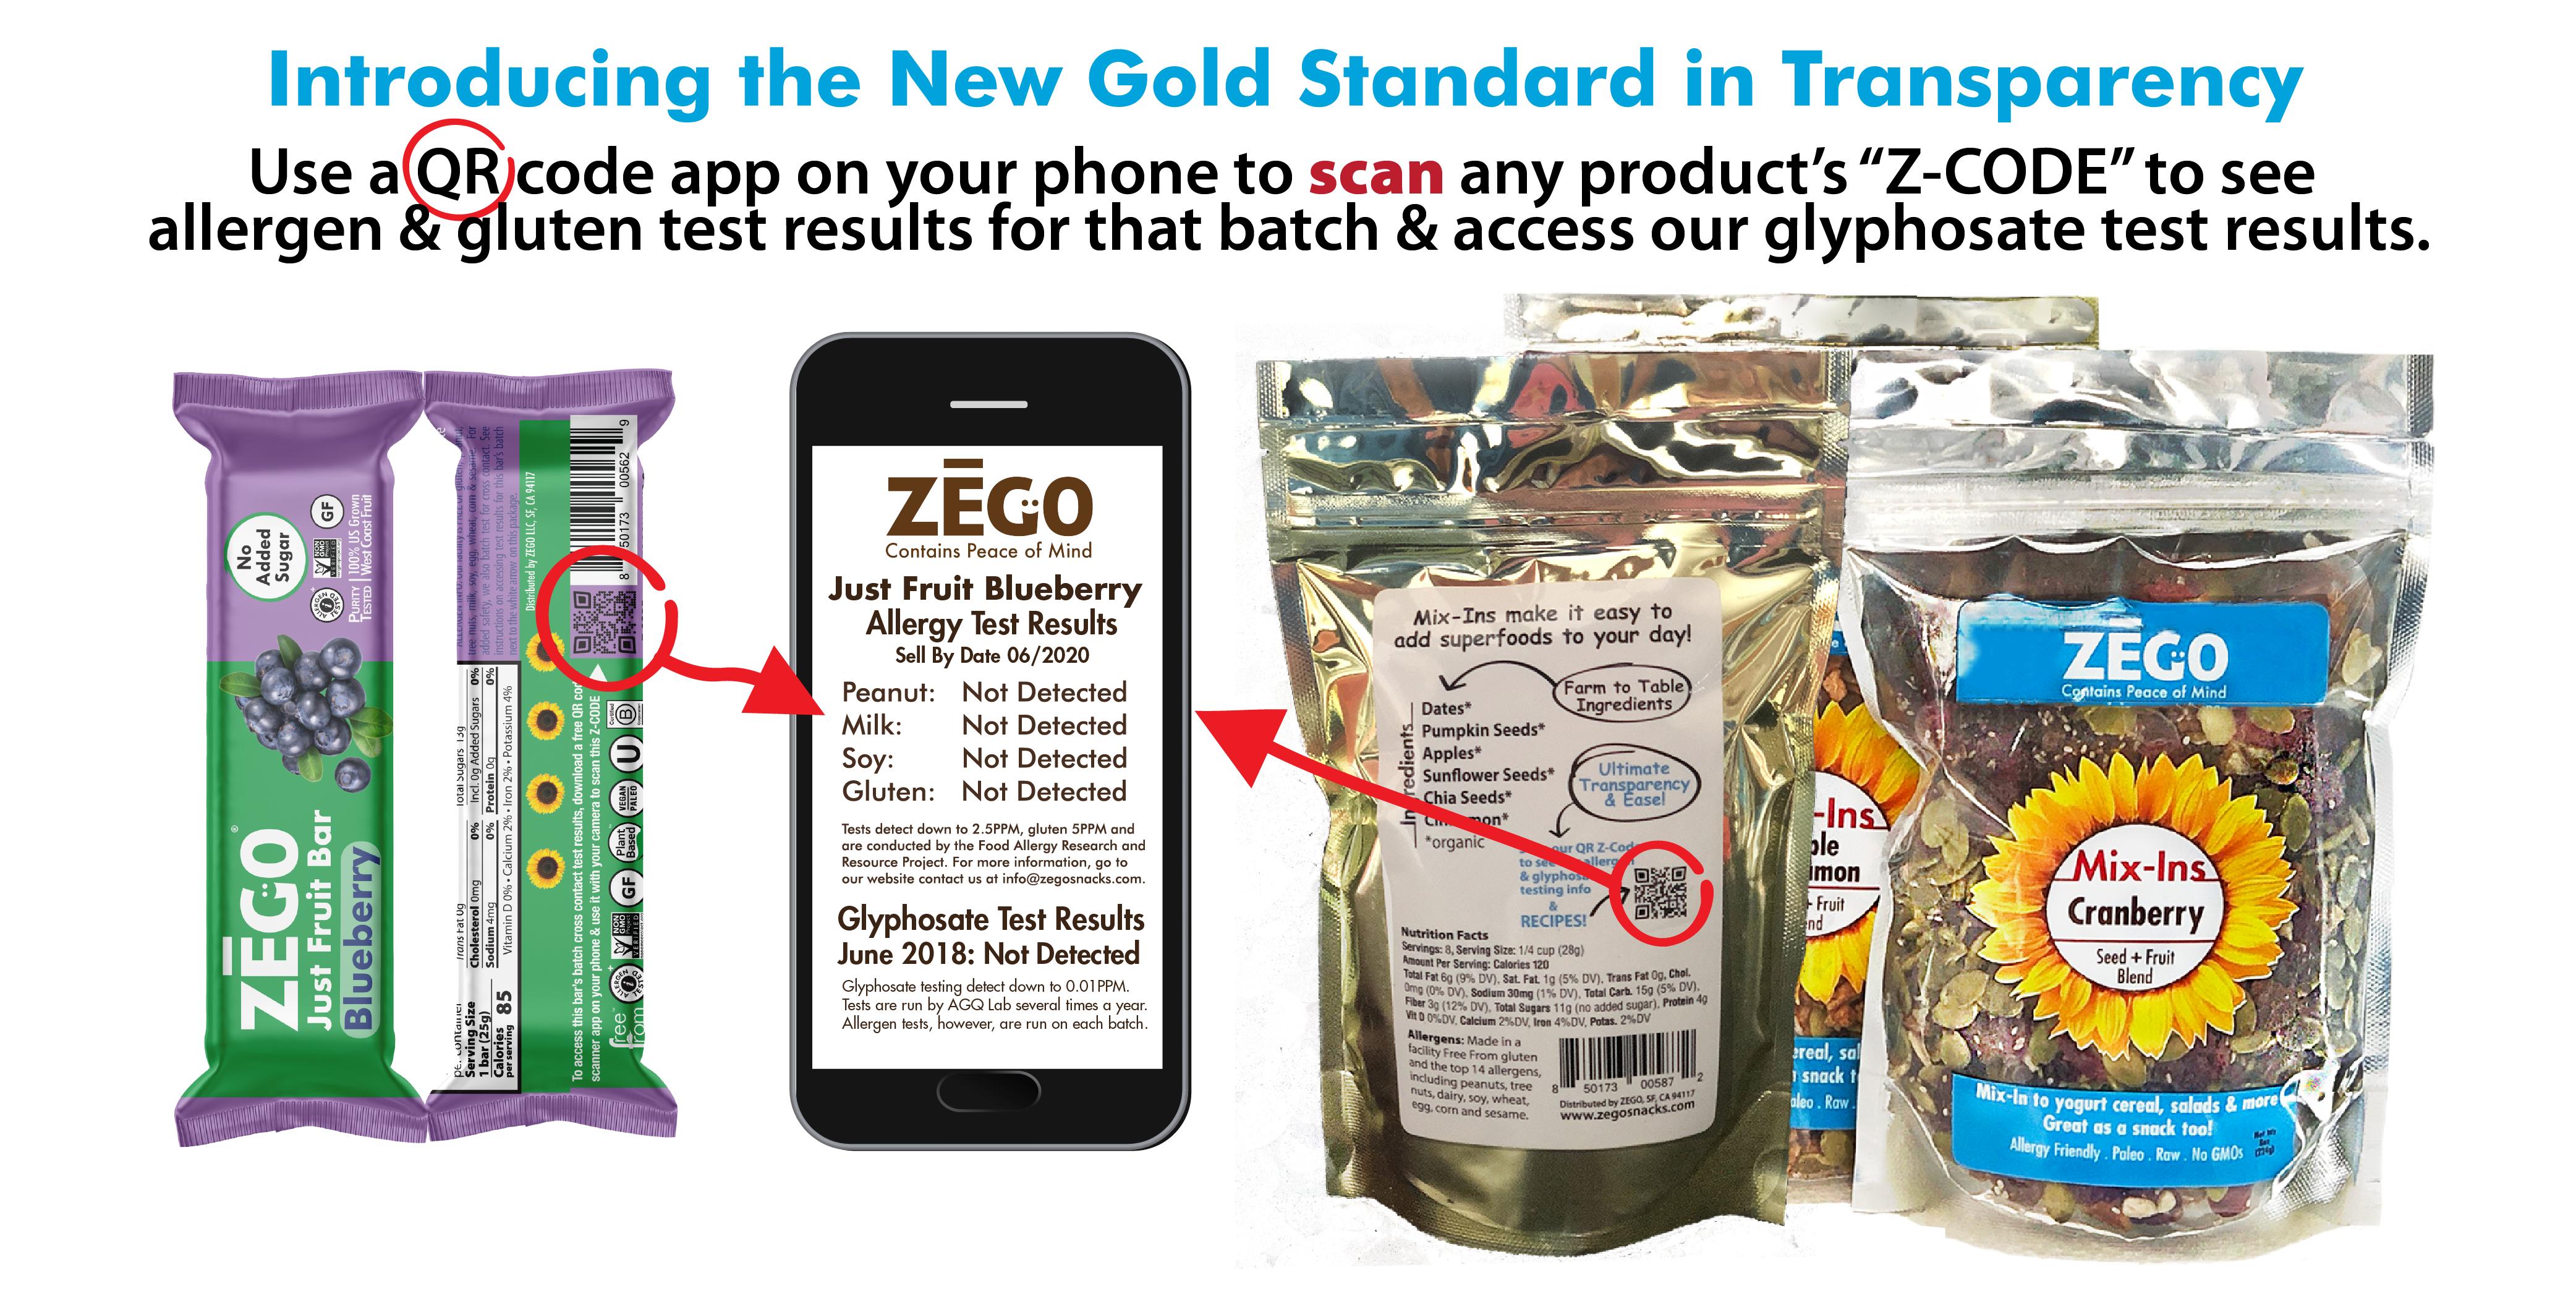 ZEGO Snacks to Provide Blockchain Traceability for New Glyphosate Testing